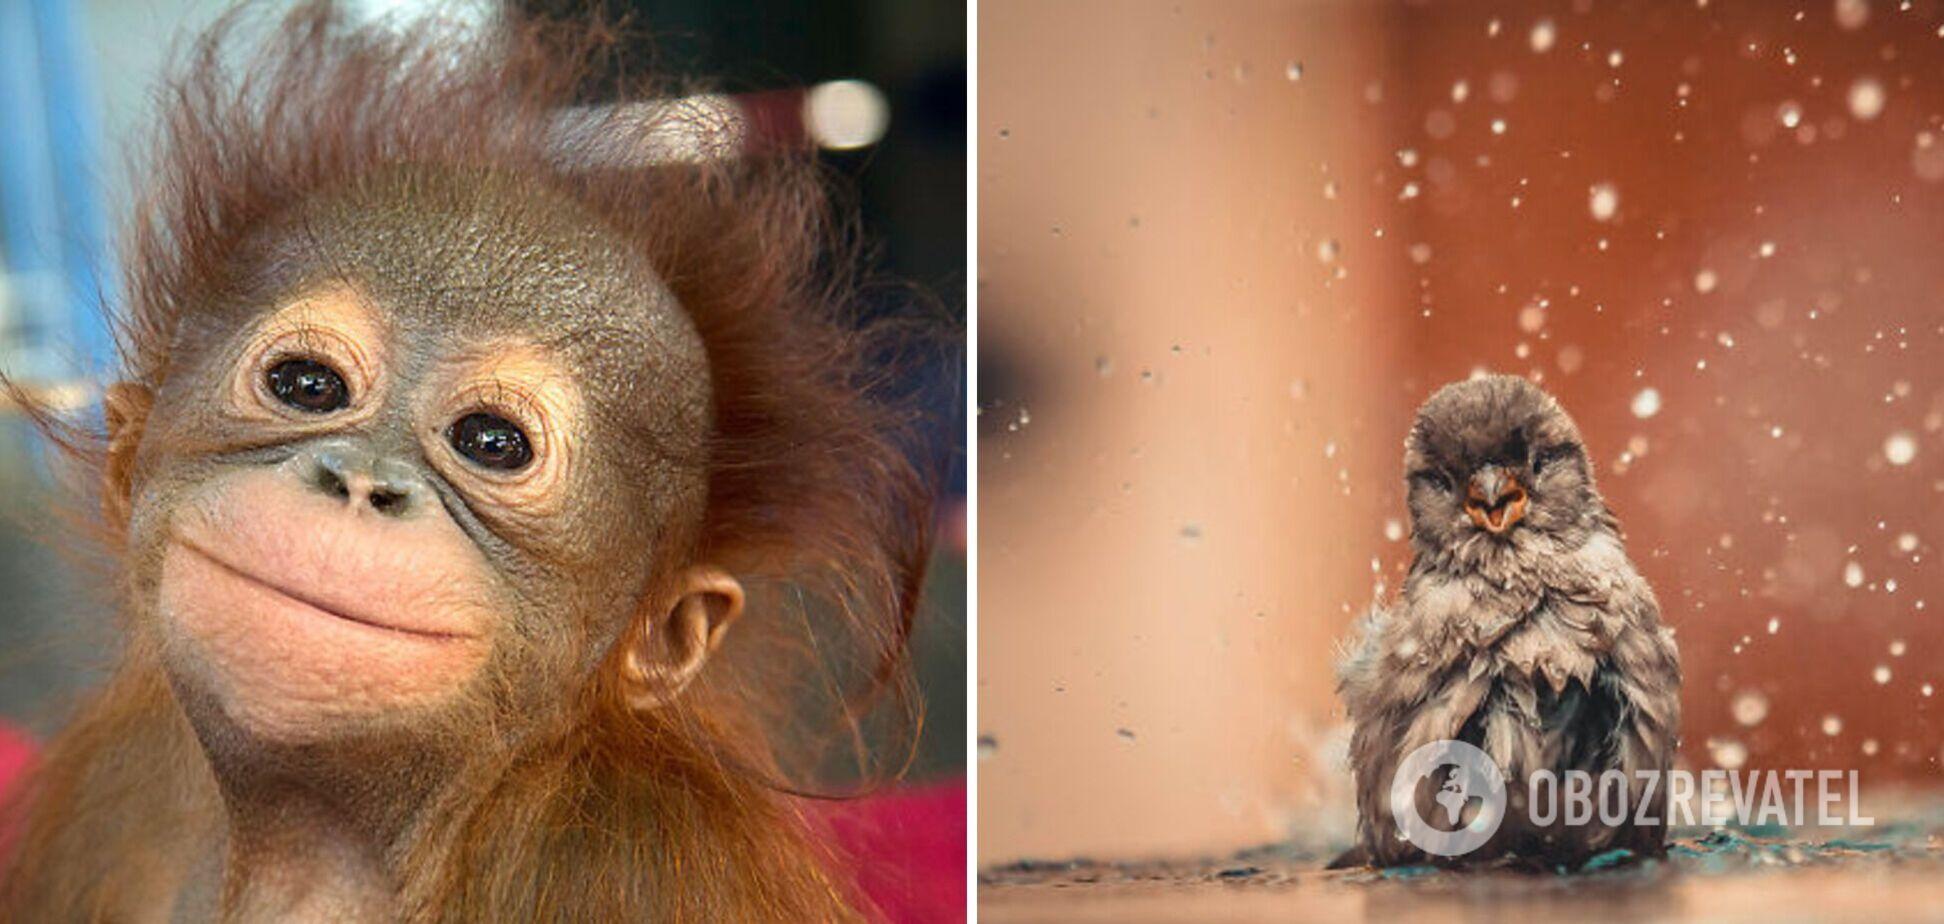 Тварини мило позують на камеру